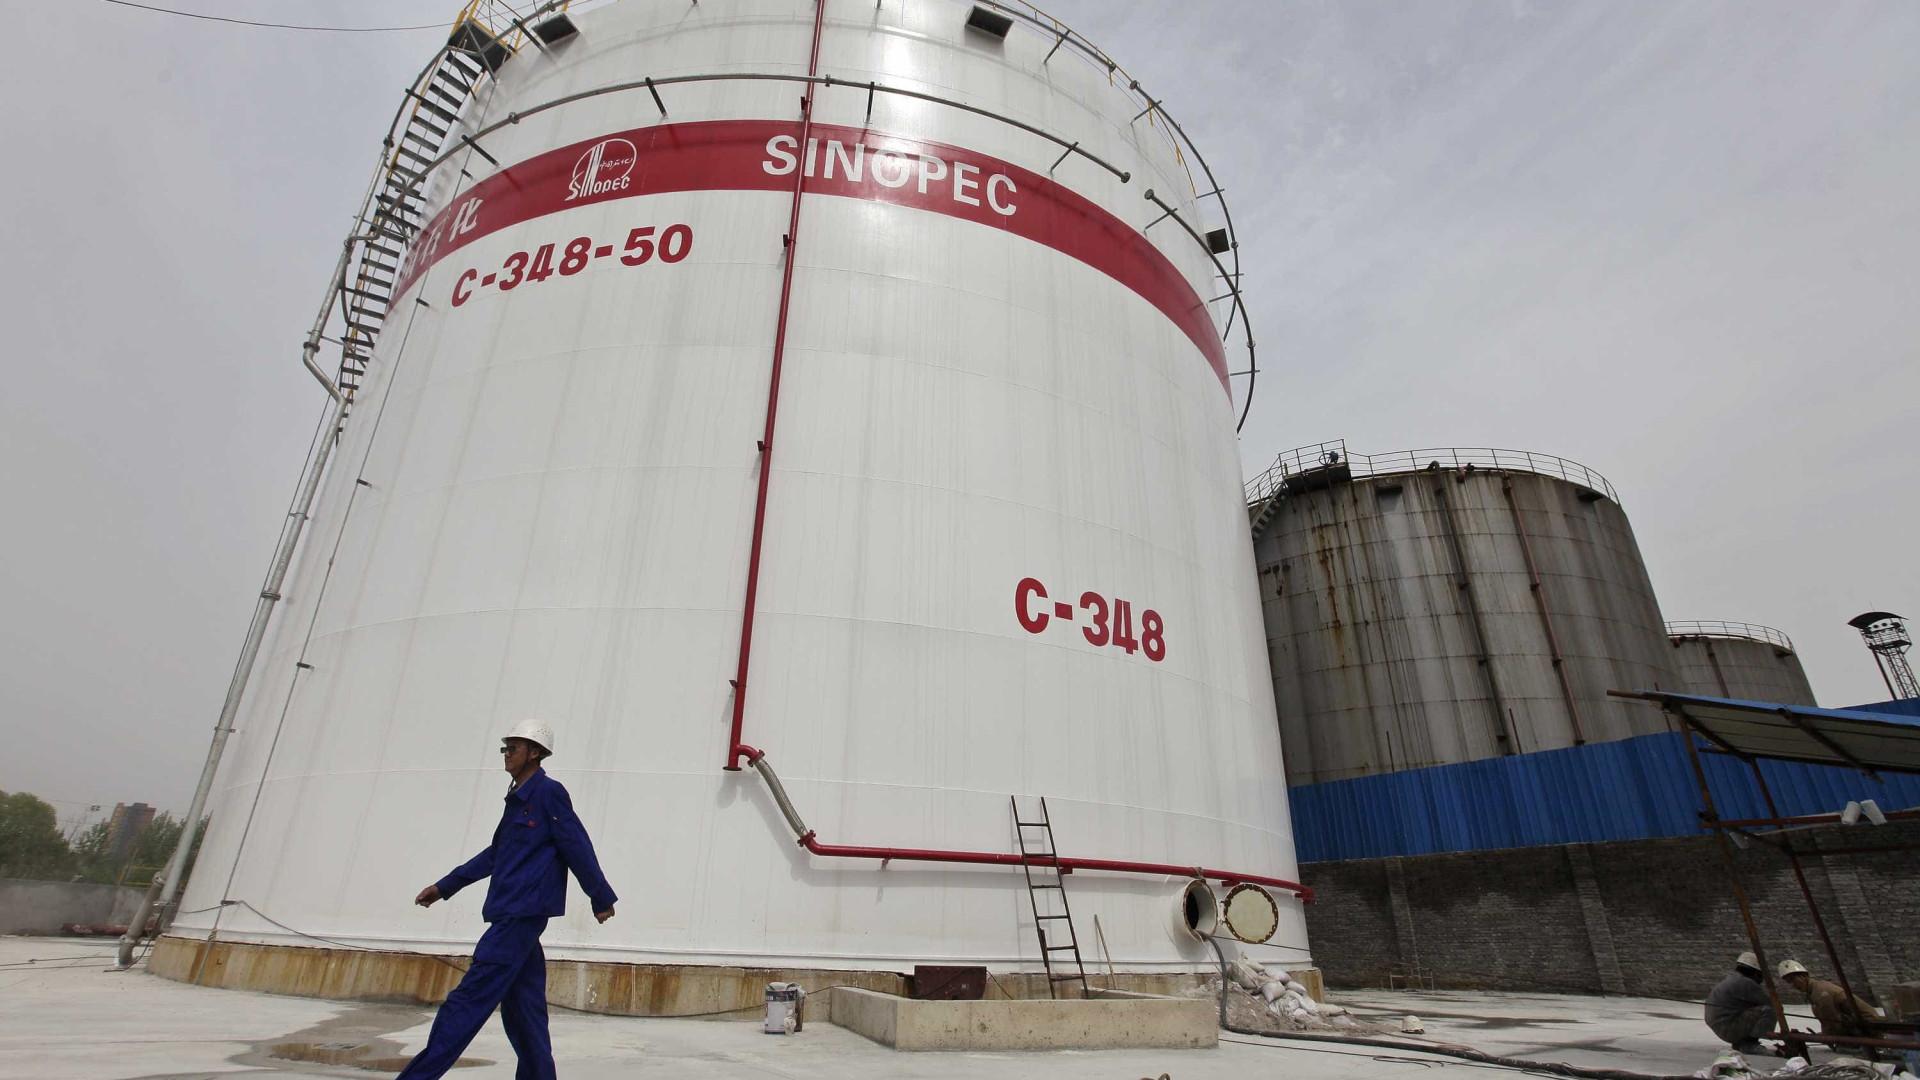 Chinesa Sinopec processa petrolífera venezuelana nos EUA